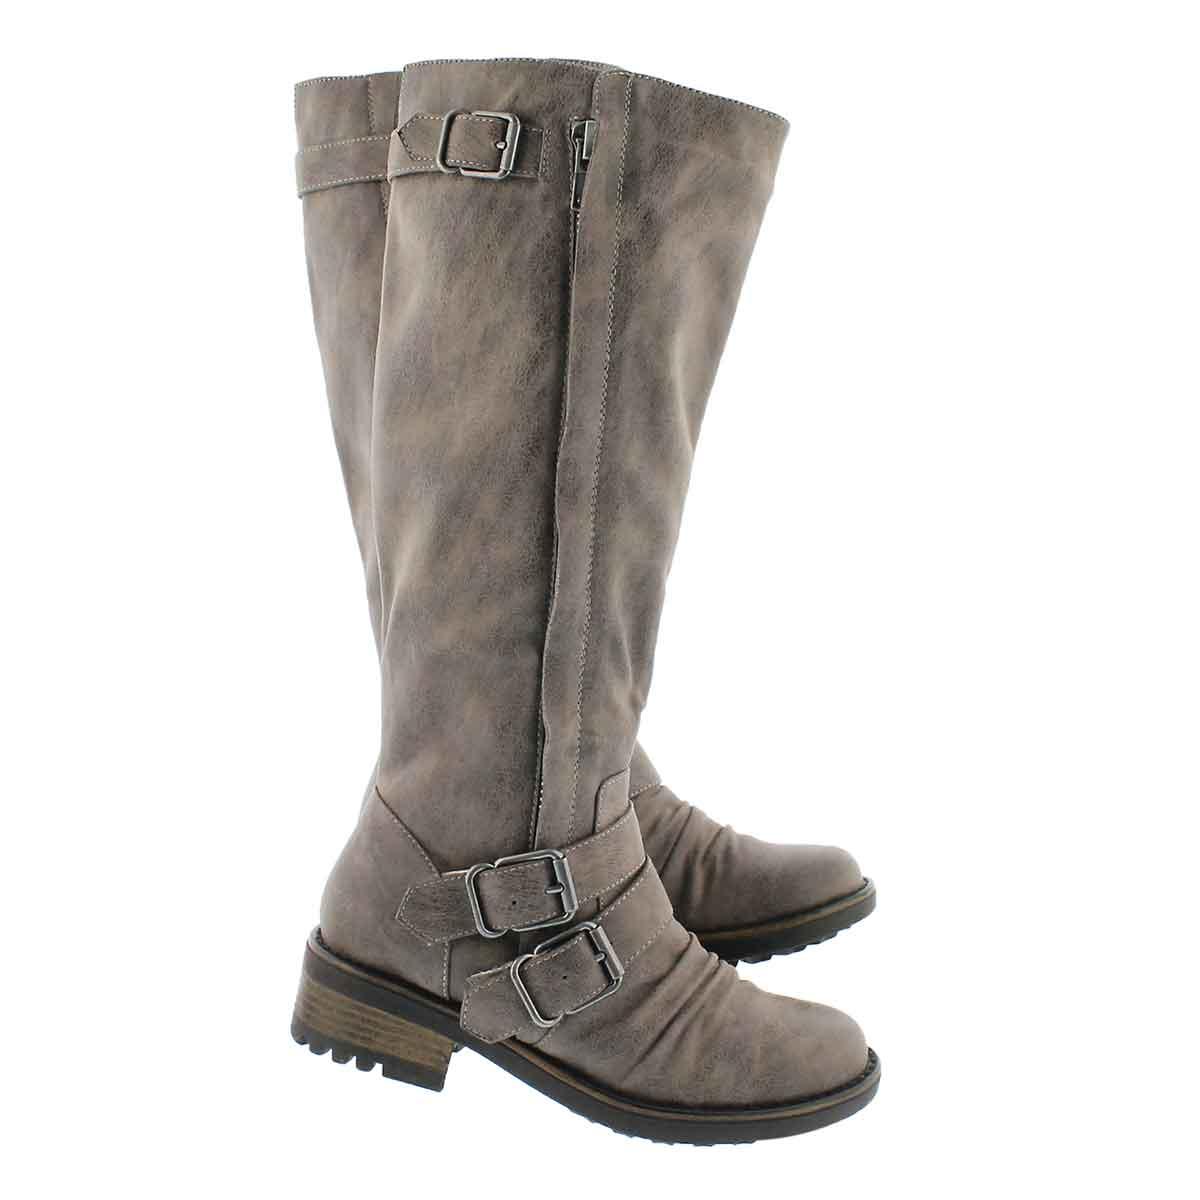 Lds Blixi III mole riding boot